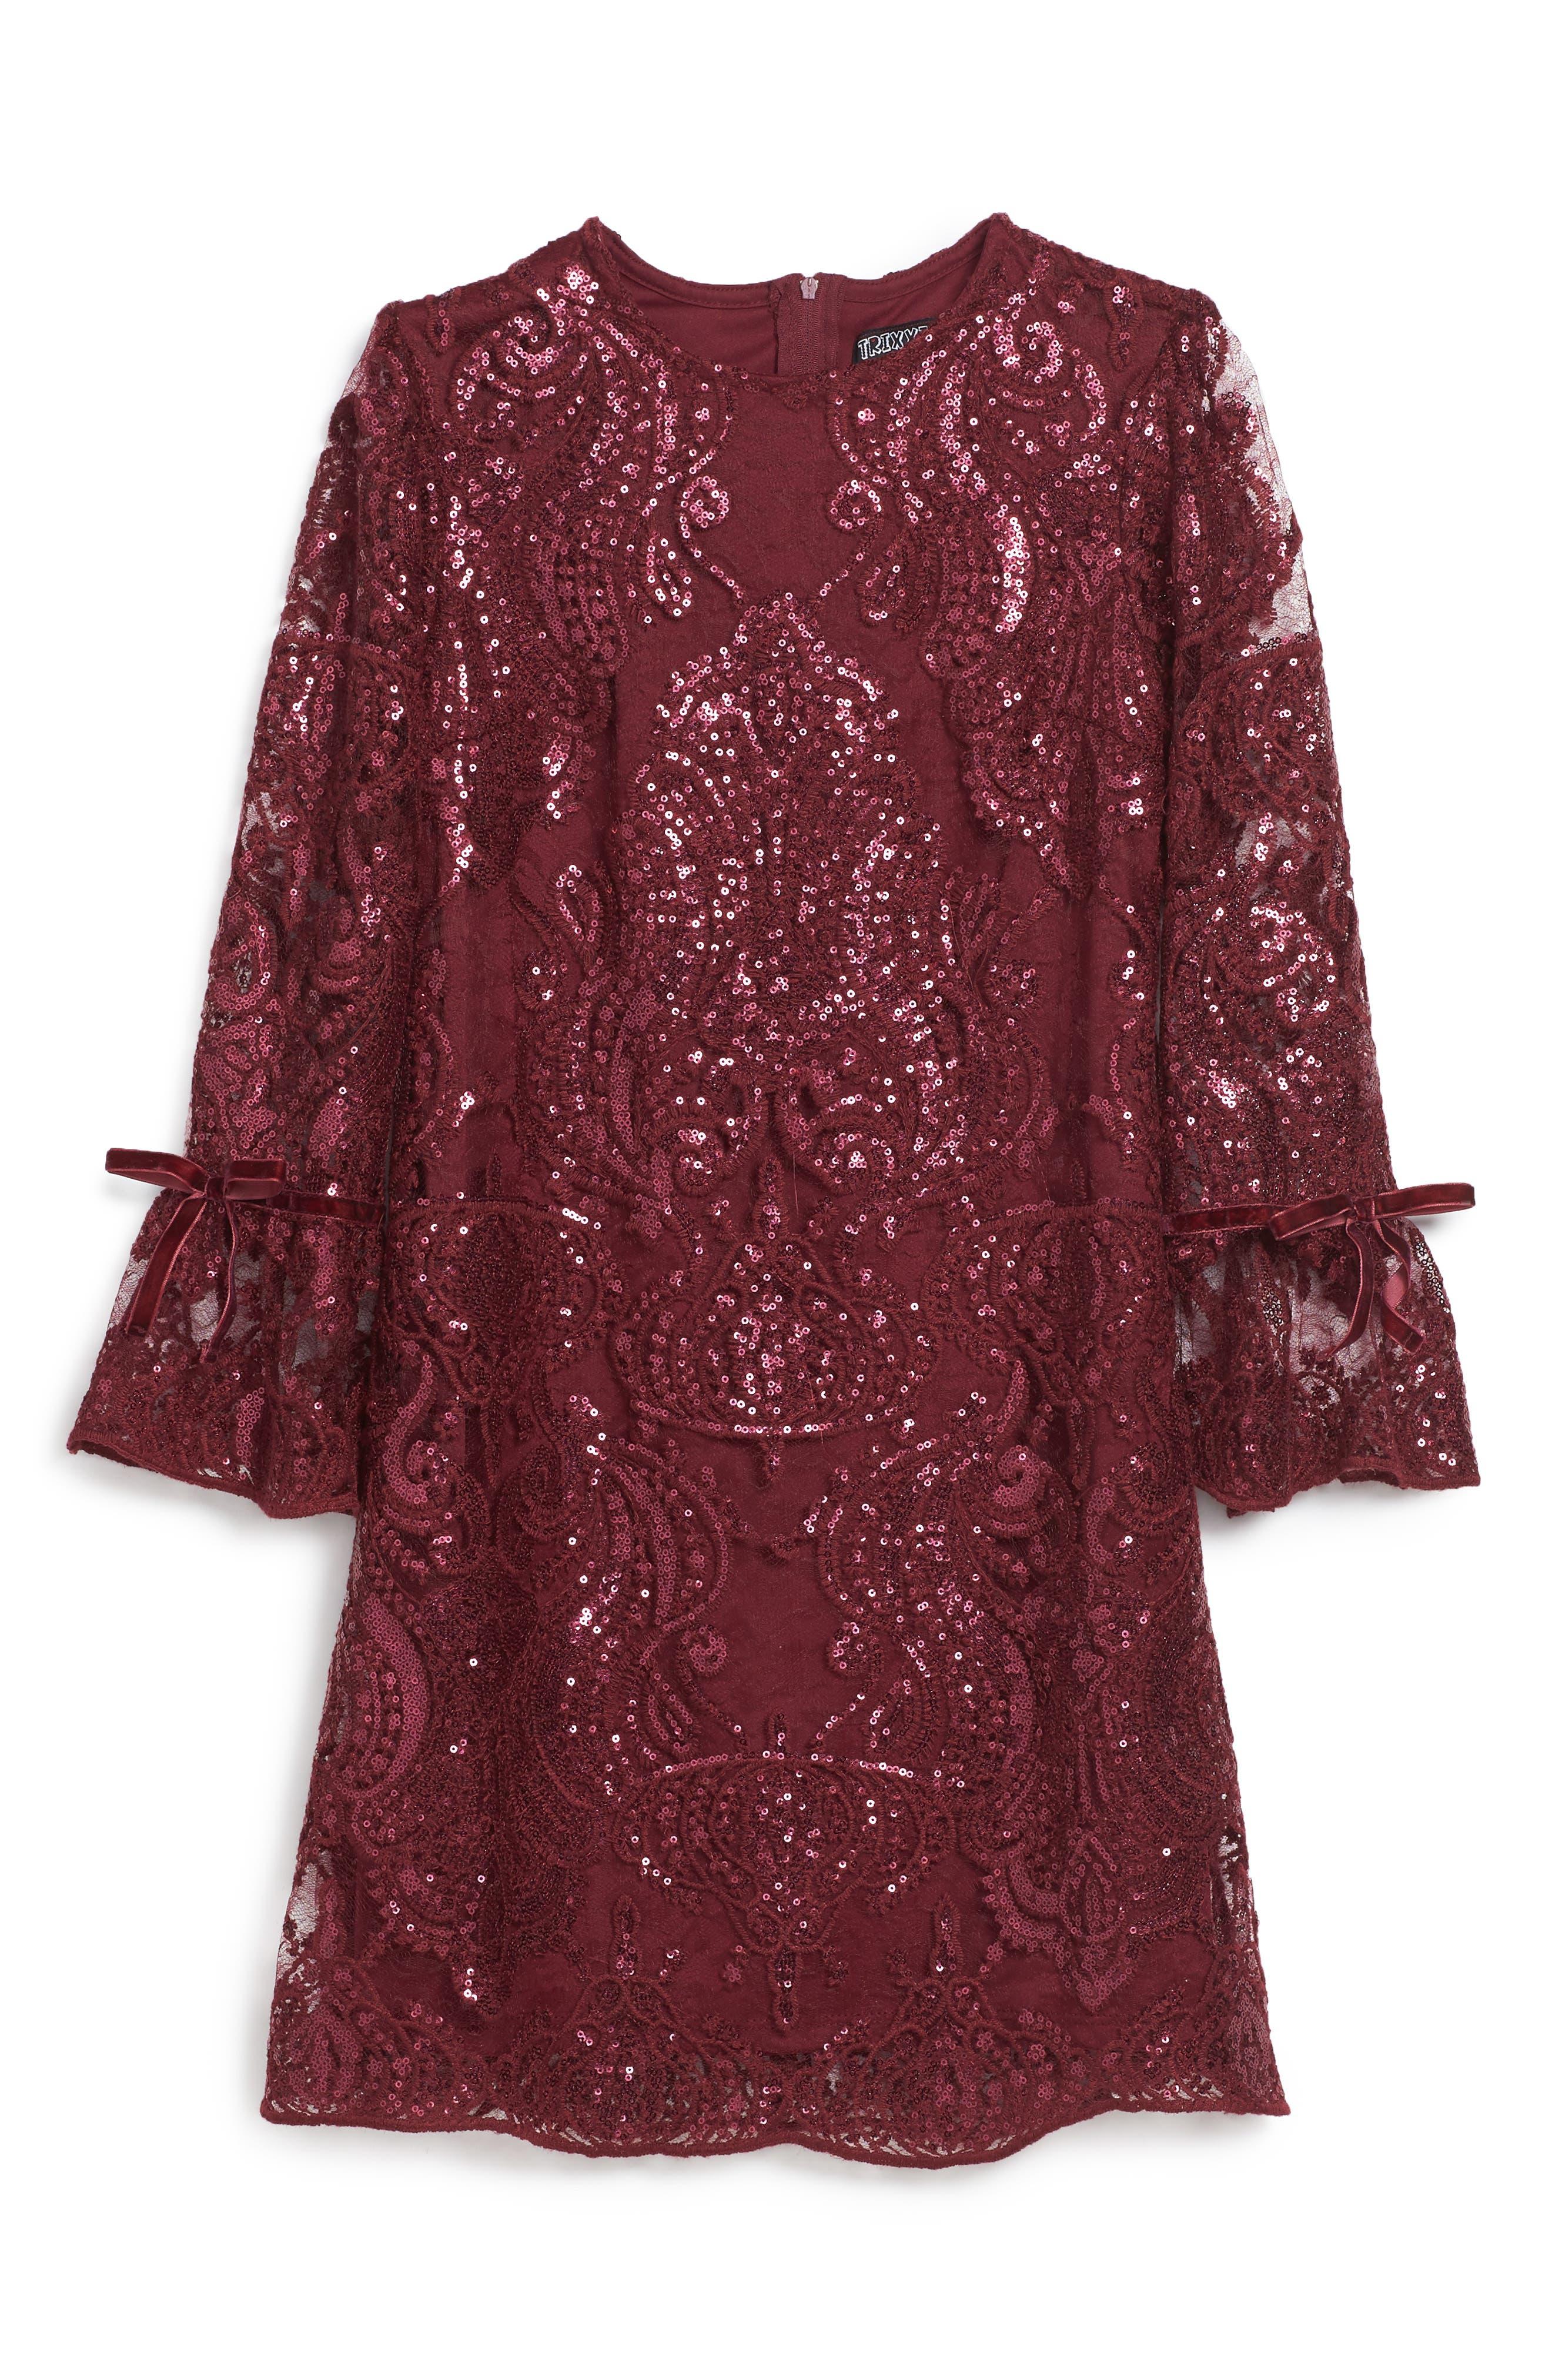 Main Image - Trixxi Scalloped Sequin Embellished Shift Dress (Big Girls)